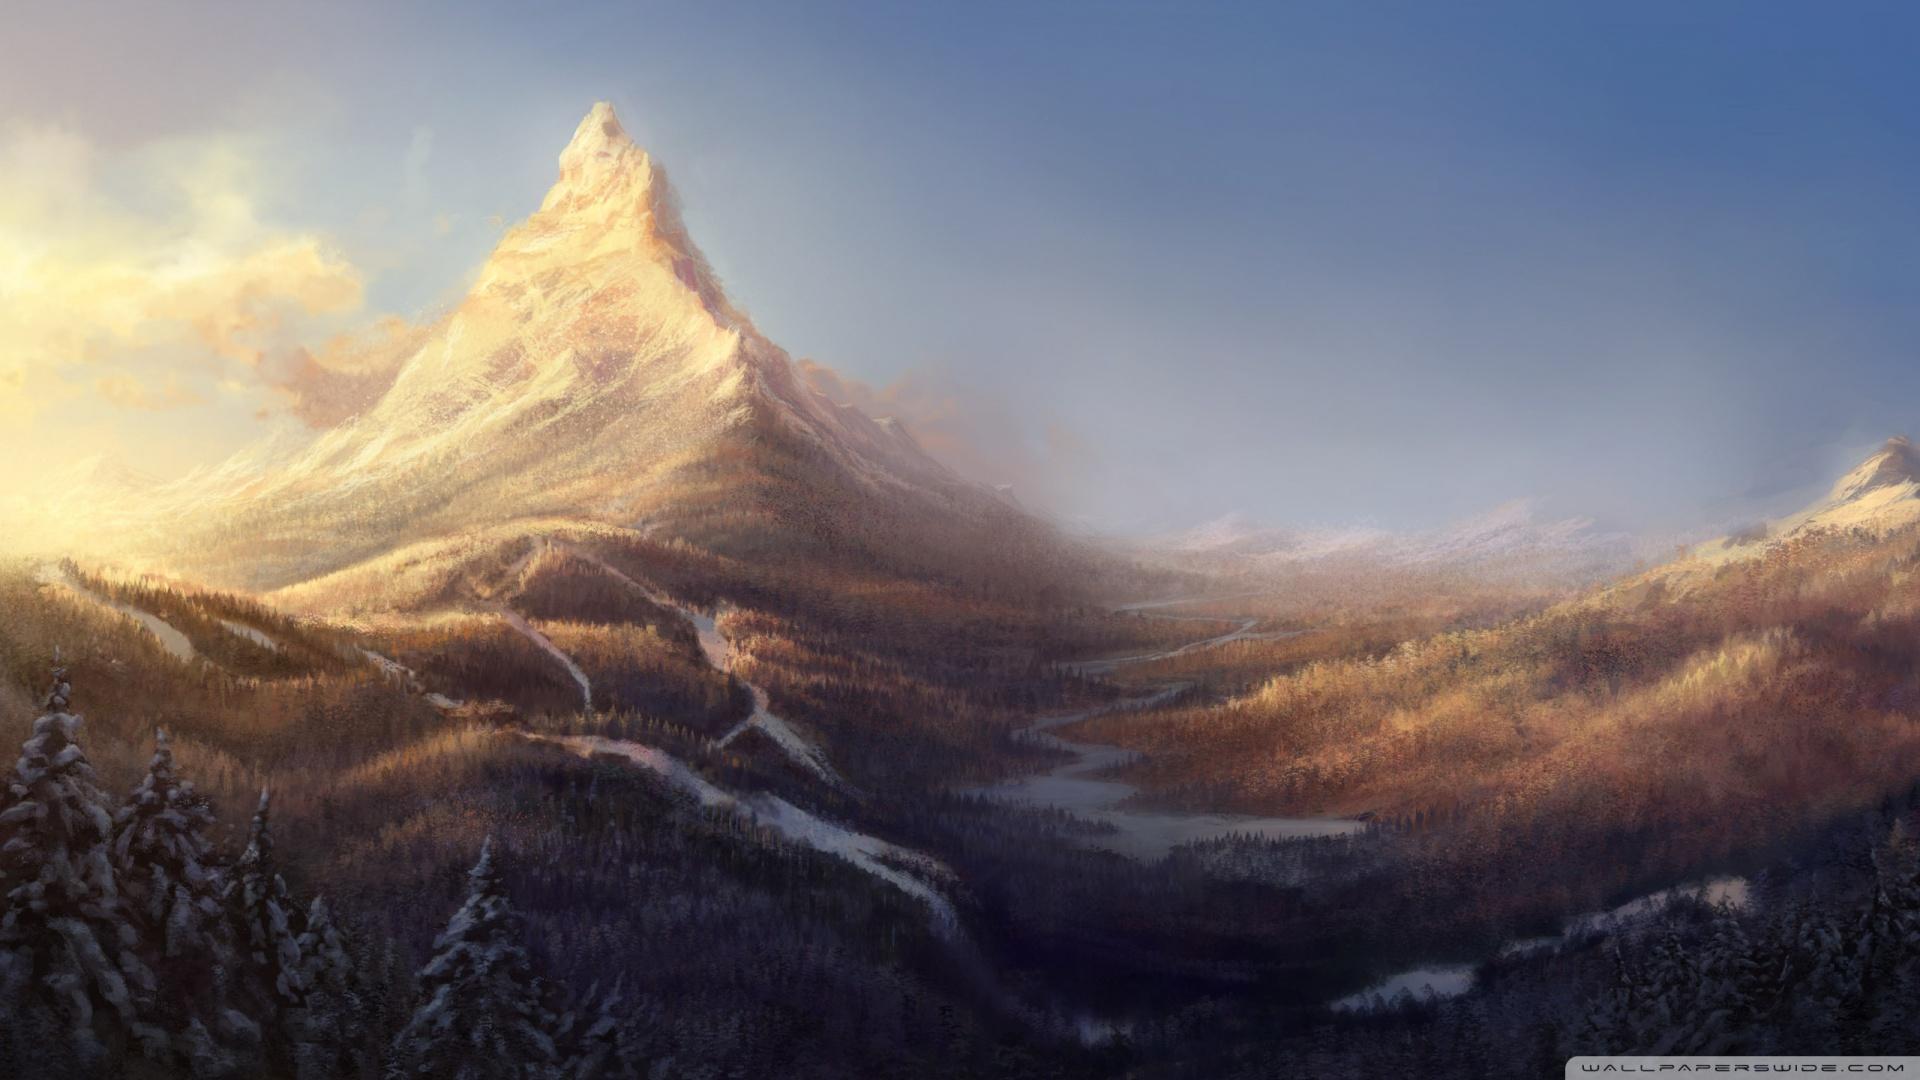 Winter Mountain wallpaper   1043714 1920x1080